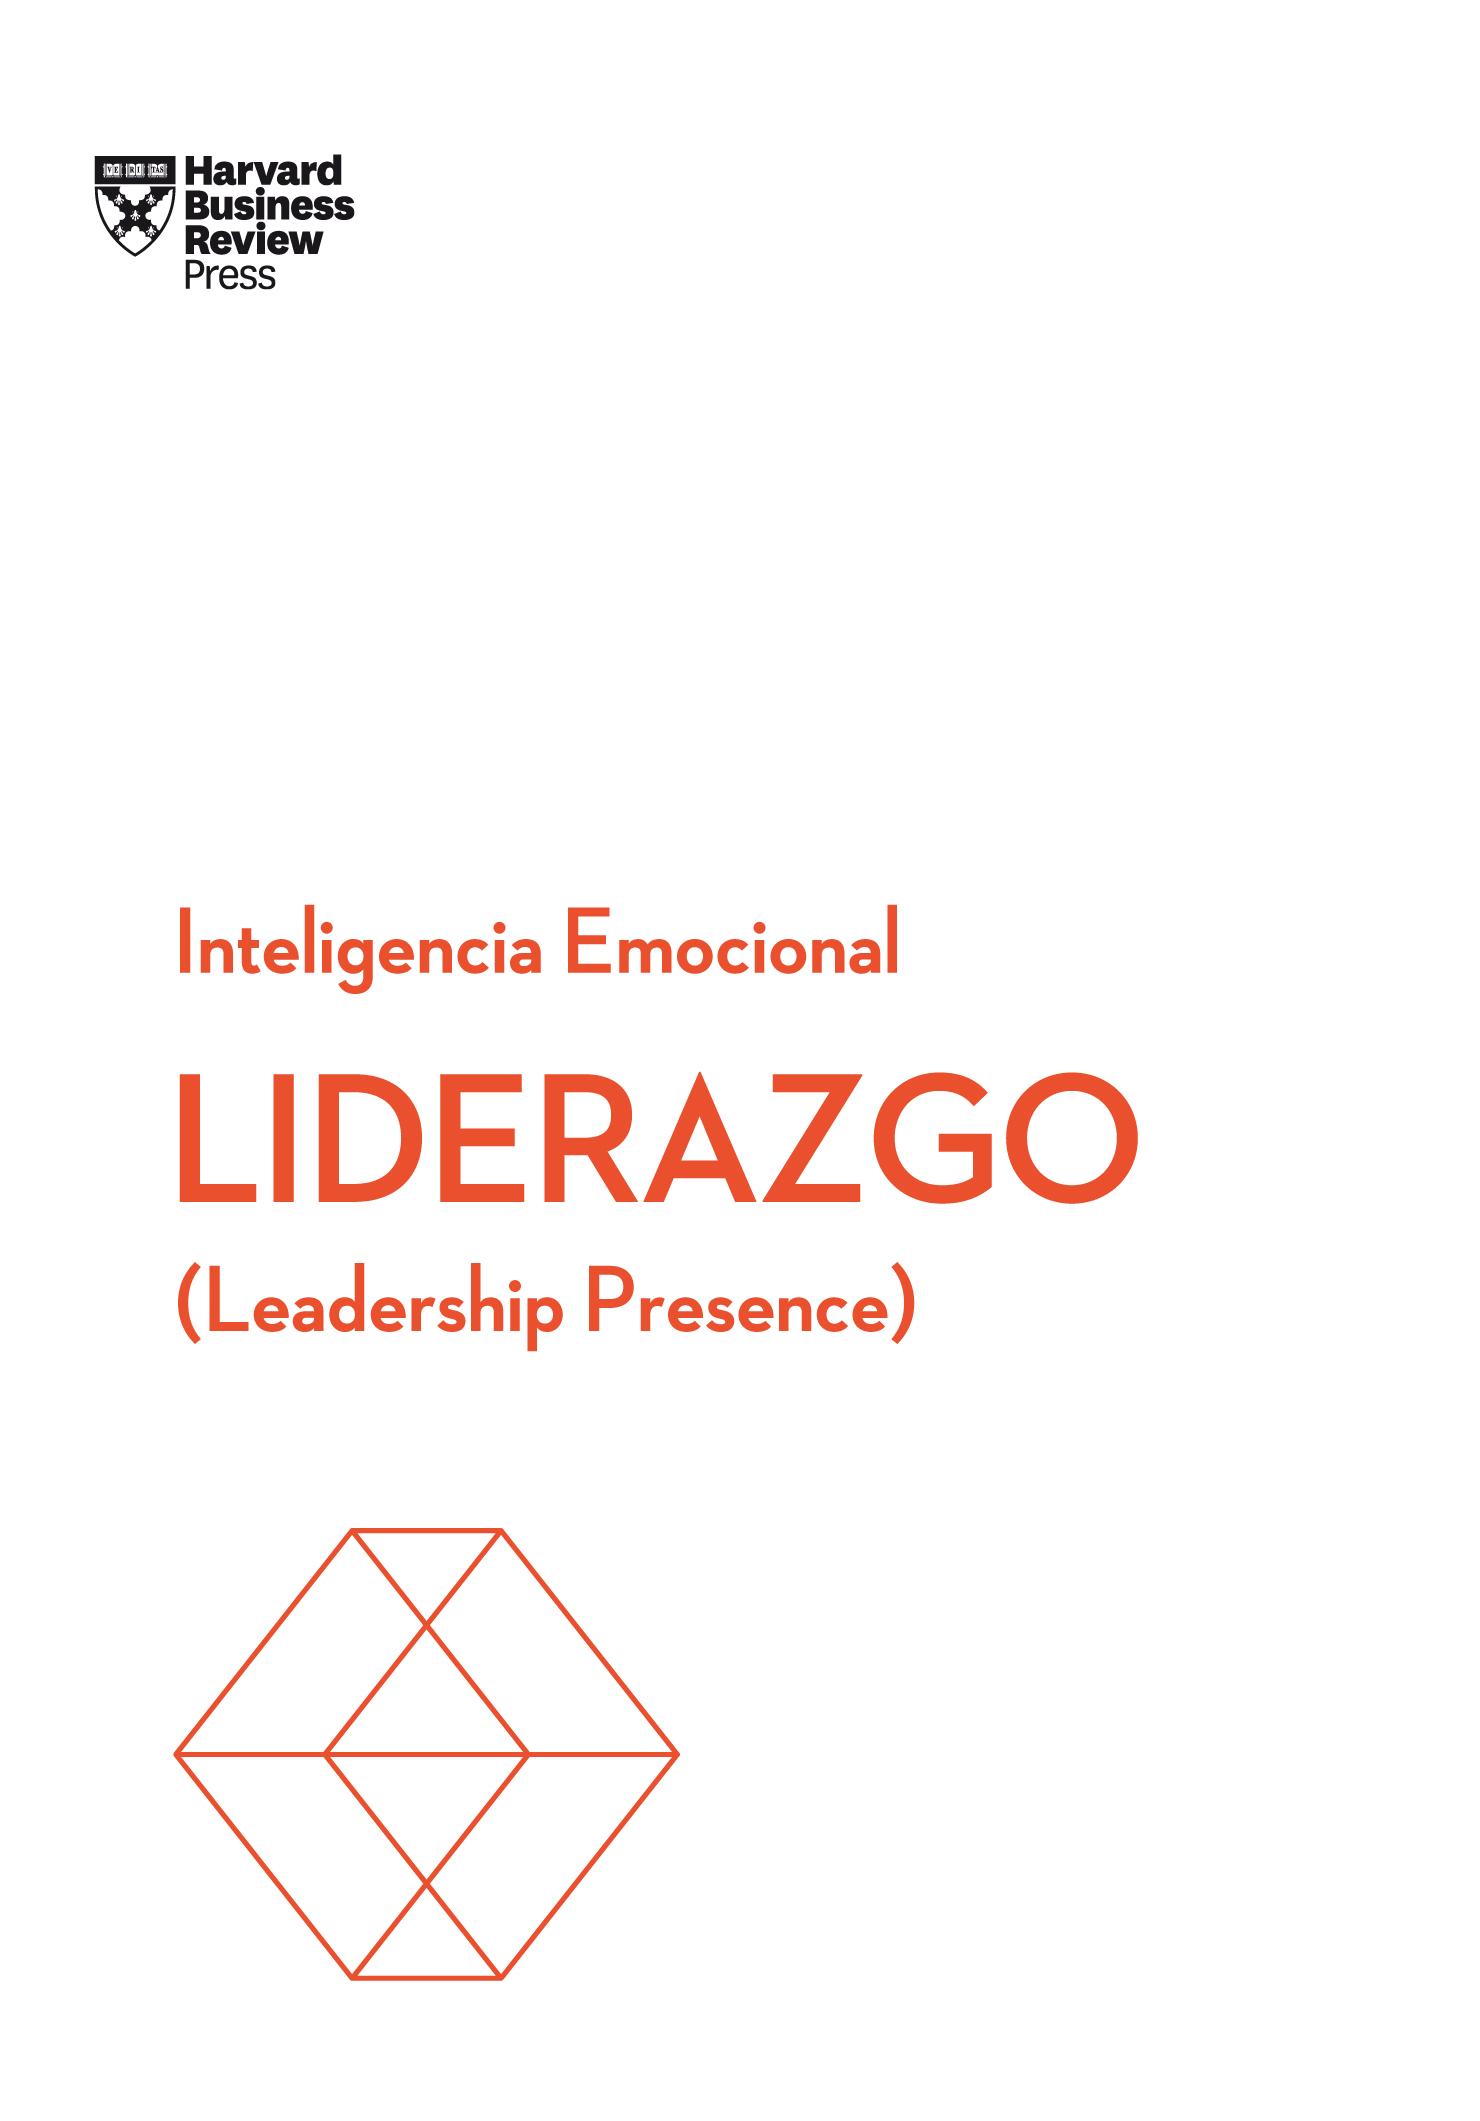 Liderazgo.  Serie Inteligencia Emocional HBR   «Leadership presence»